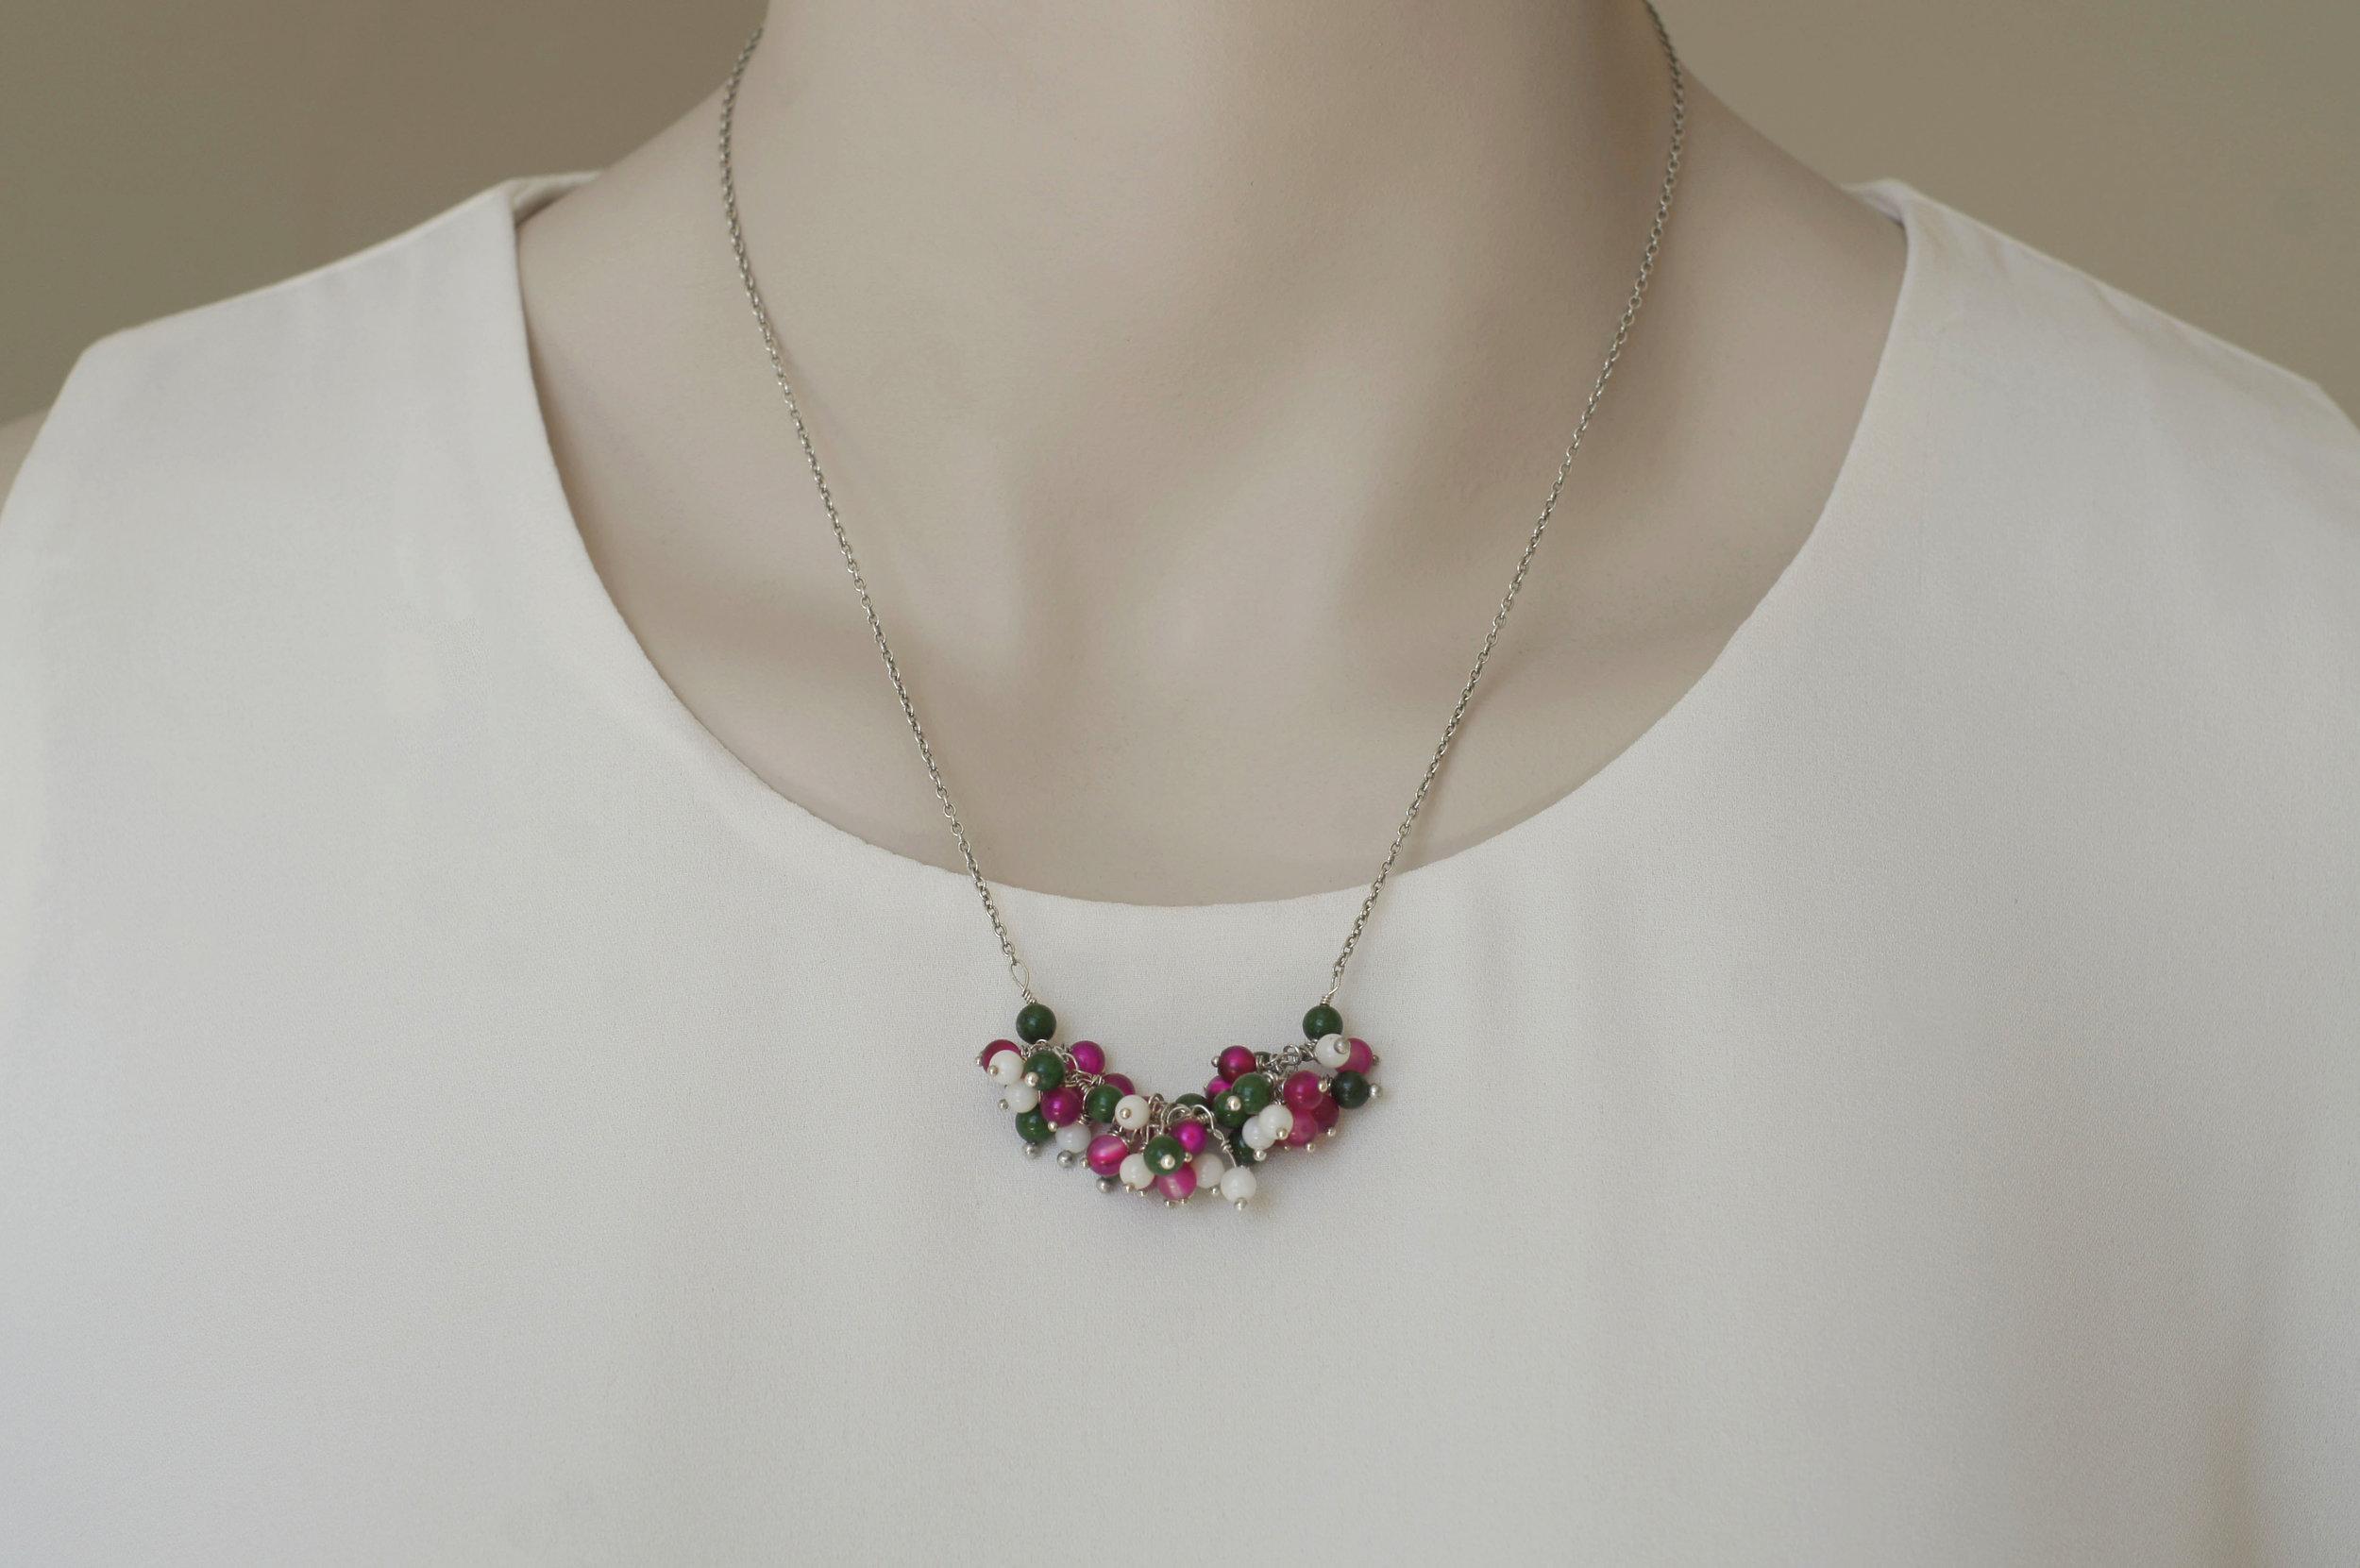 Petunia Flower Necklace